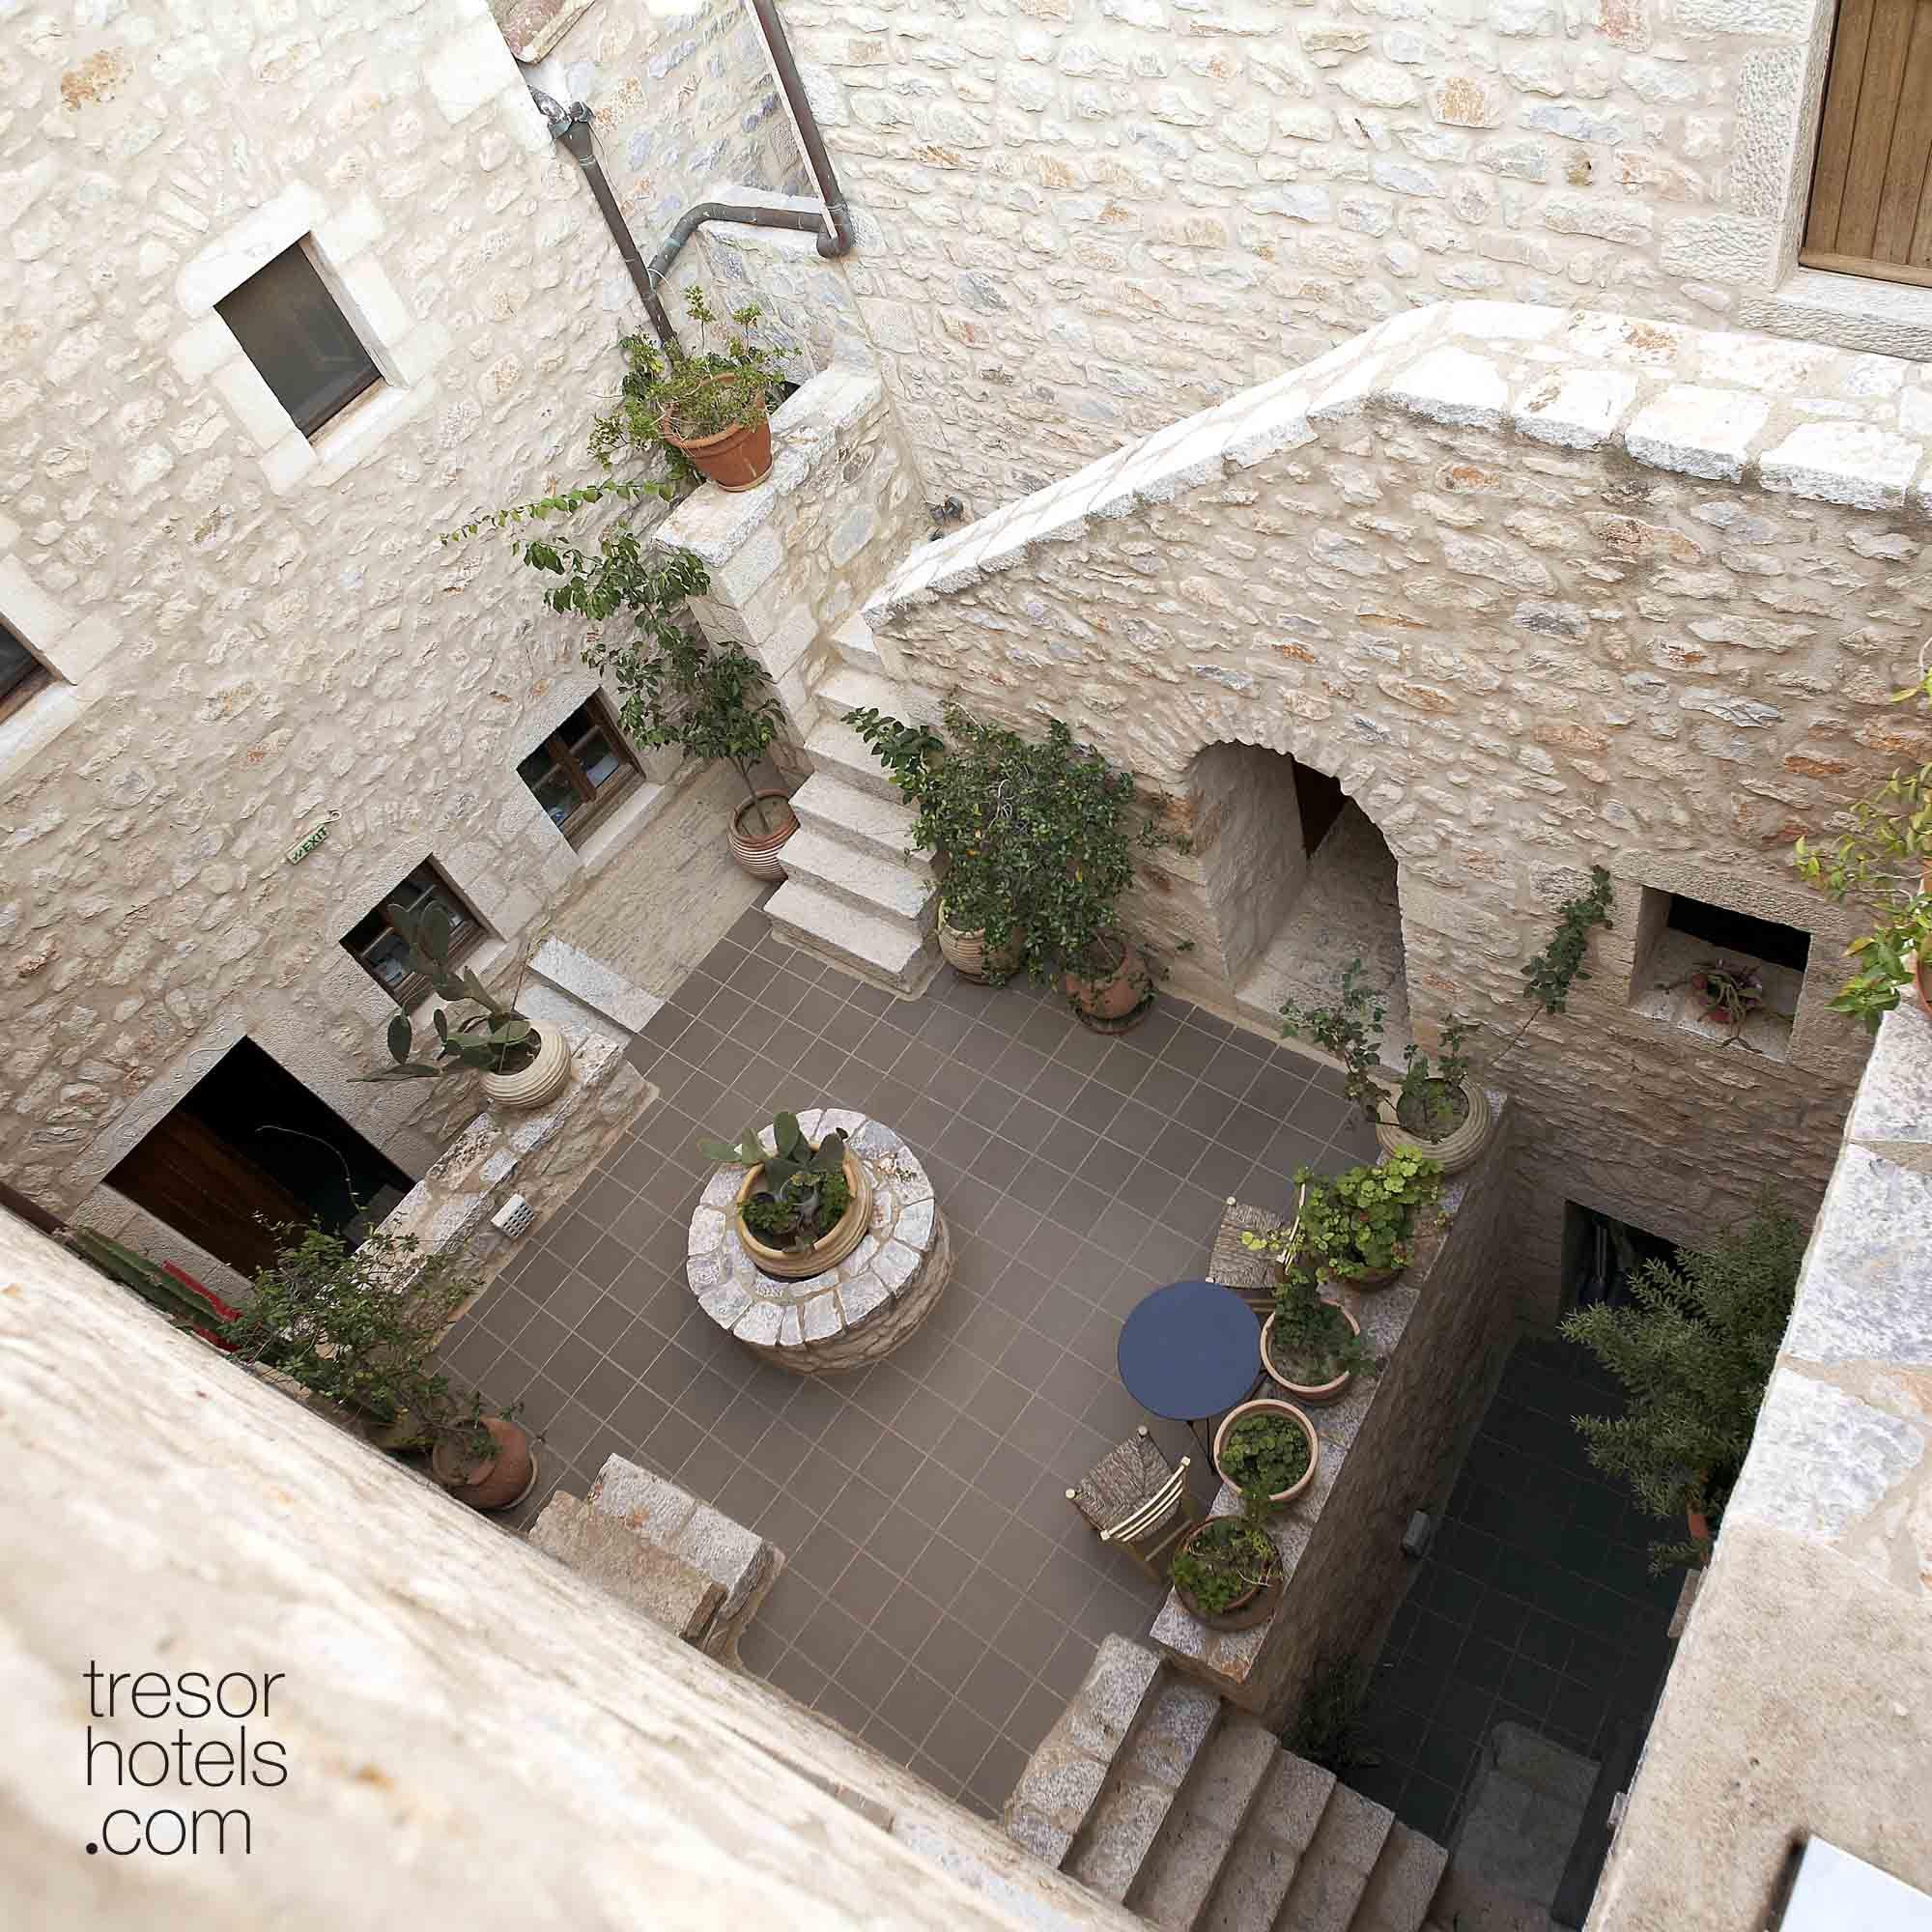 Kyrimai Boutique Hotel Gerolimenas Manis Peloponnese Greece